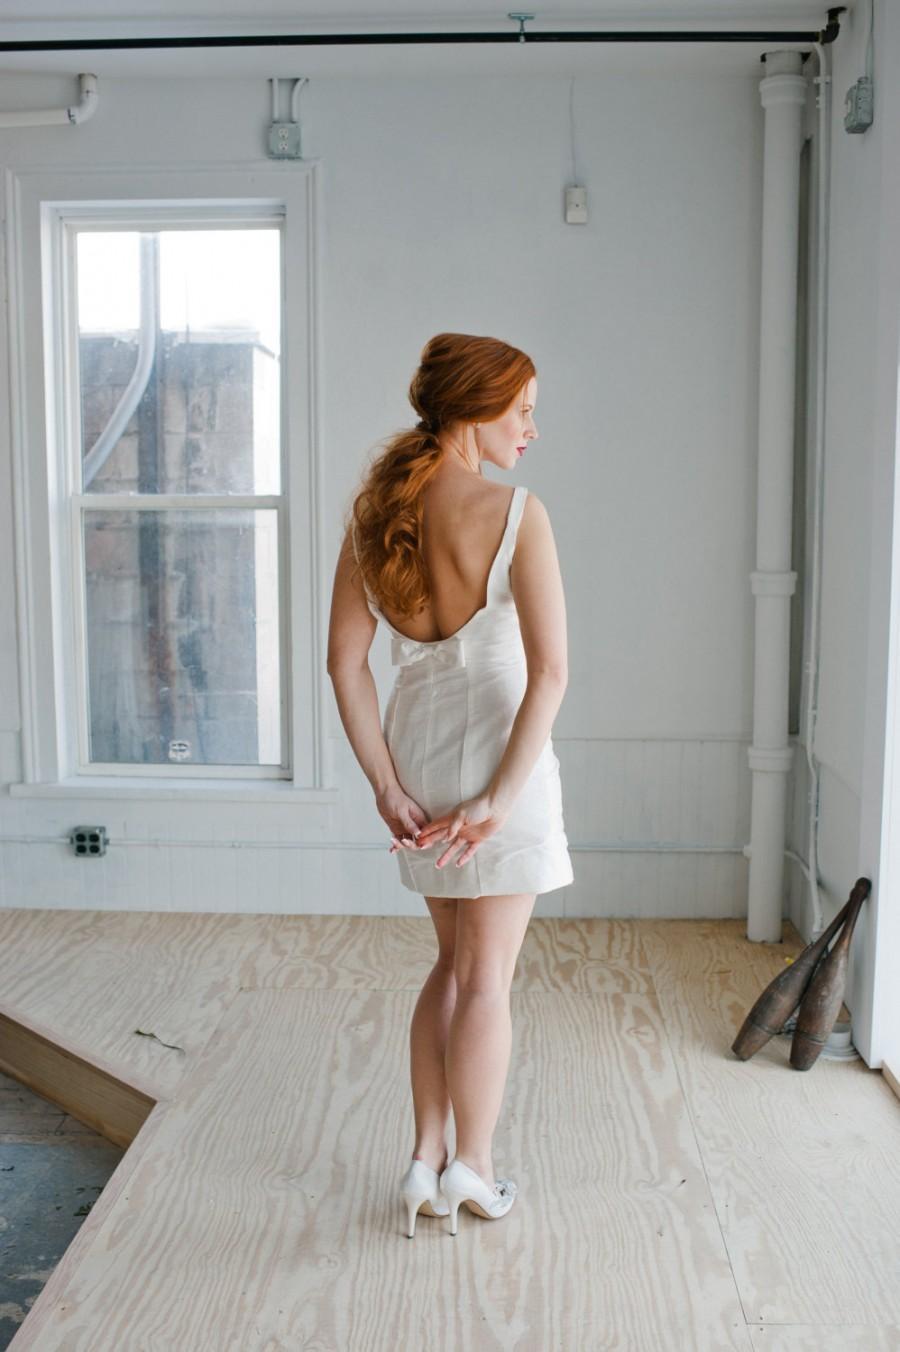 Wedding - Elsa Wedding Dress; Handmade Wedding Dress, charming mini dress with open back and cute bow